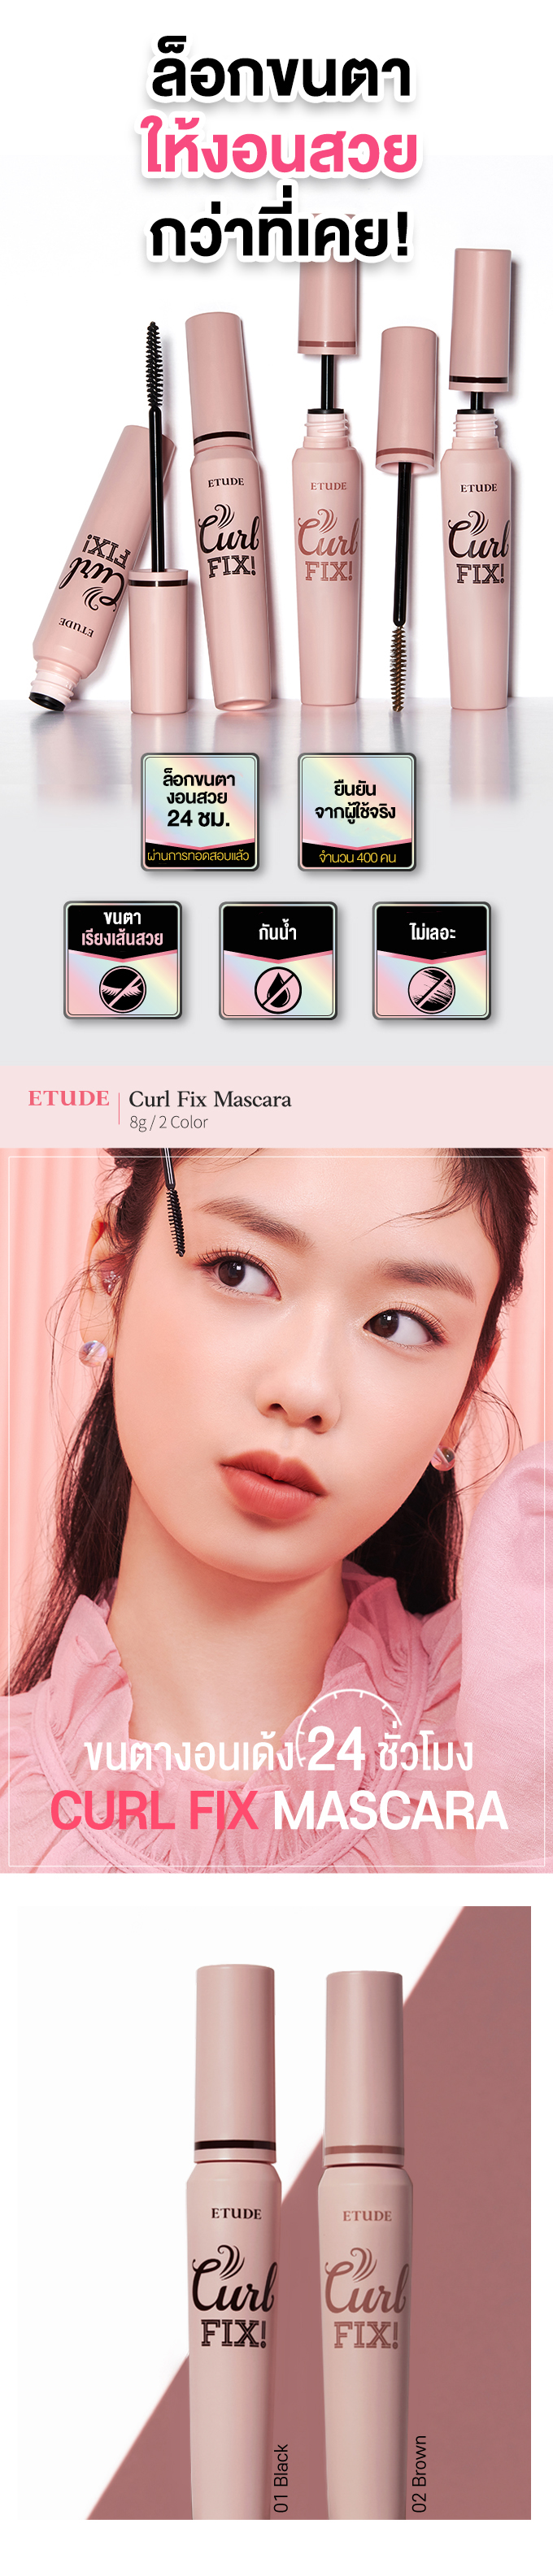 curl_fix_mascara_21ad_sub_TH_1